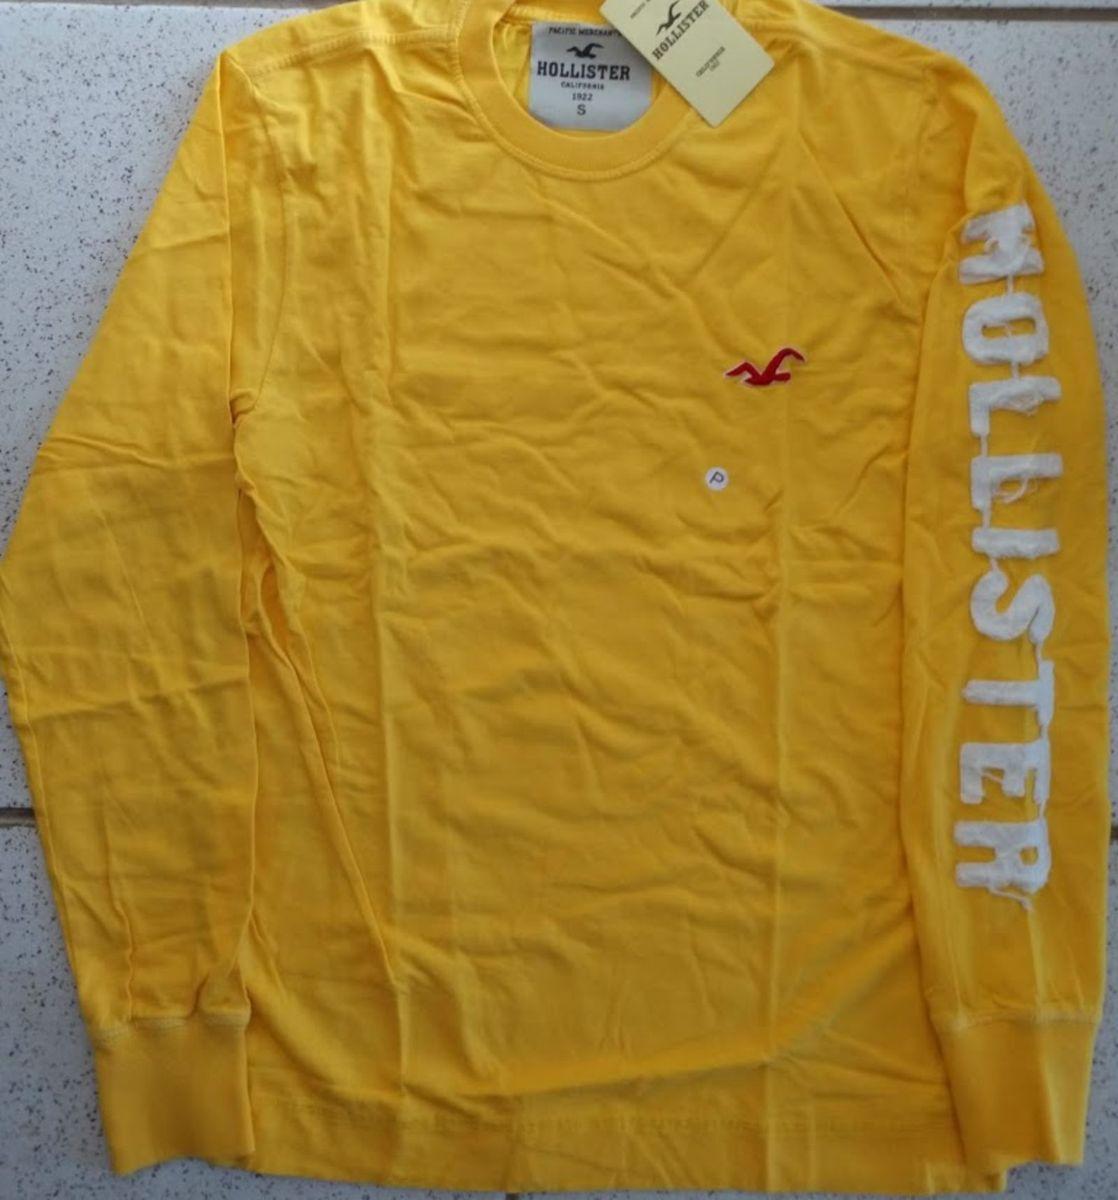 06f3b89f0e camisa hollister amarelo manga longa tam p - camisas hollister